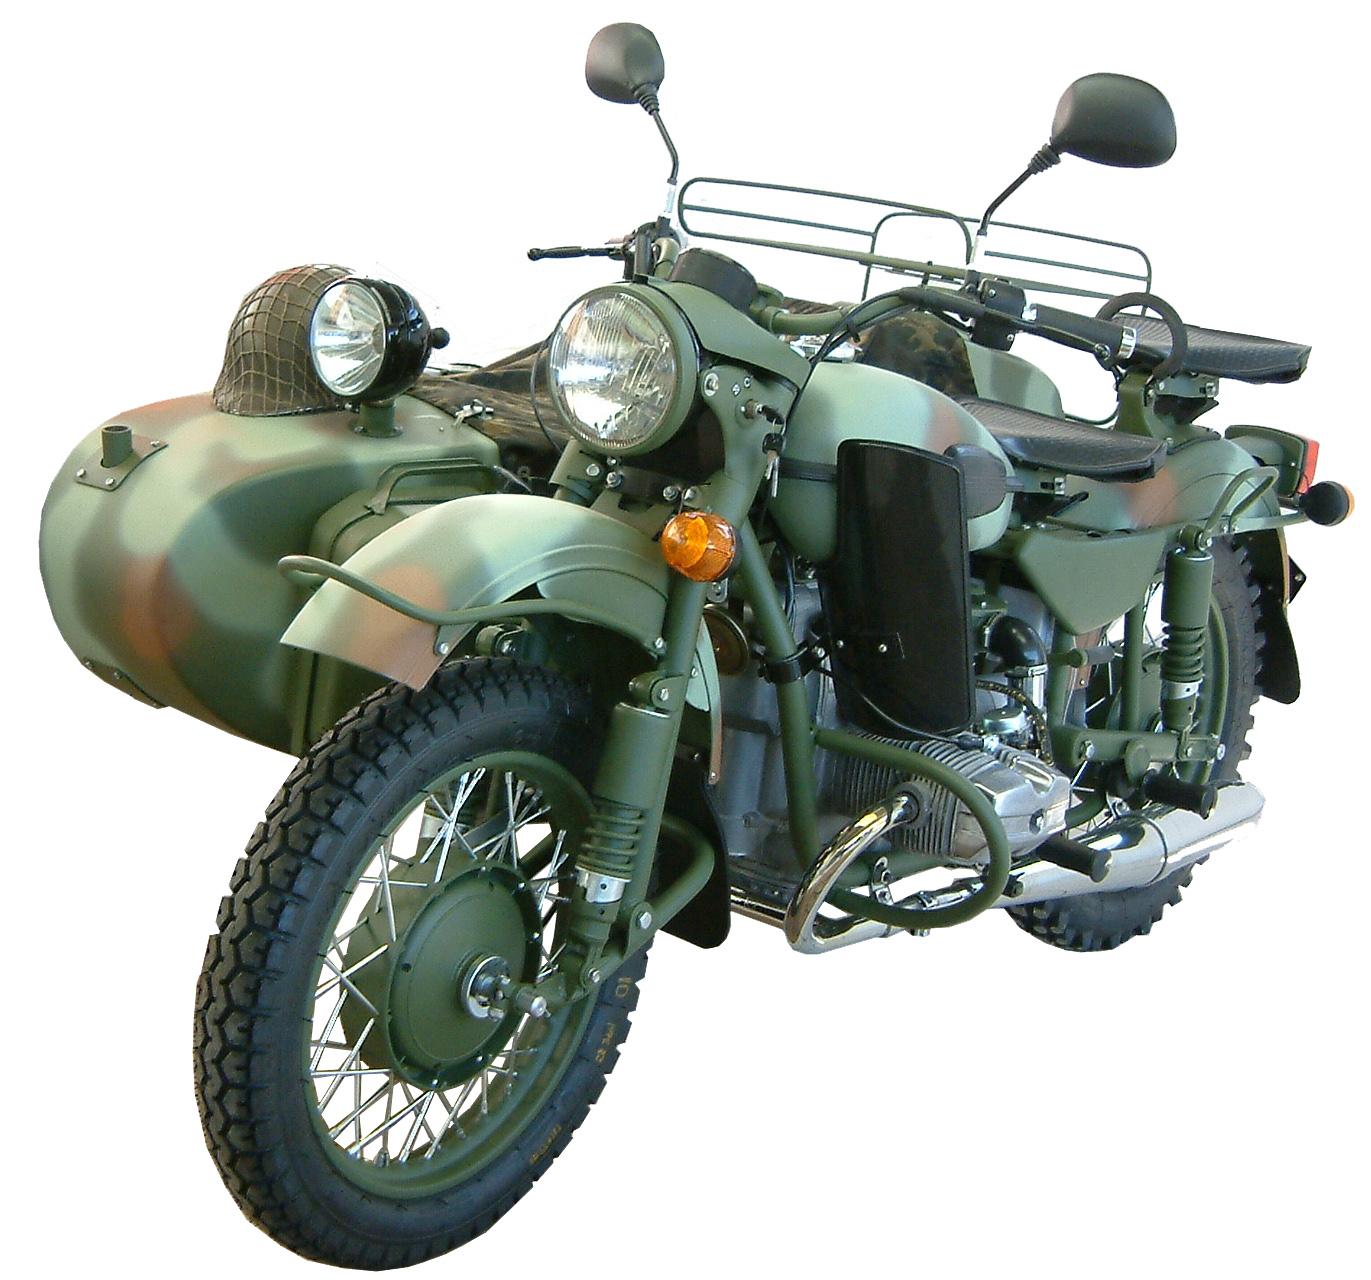 Ural Ranger/Sportsman/Retro/Tourist/Octubre Rojo (12.300-/11.610-/12.900-/10.835-/n.d.)